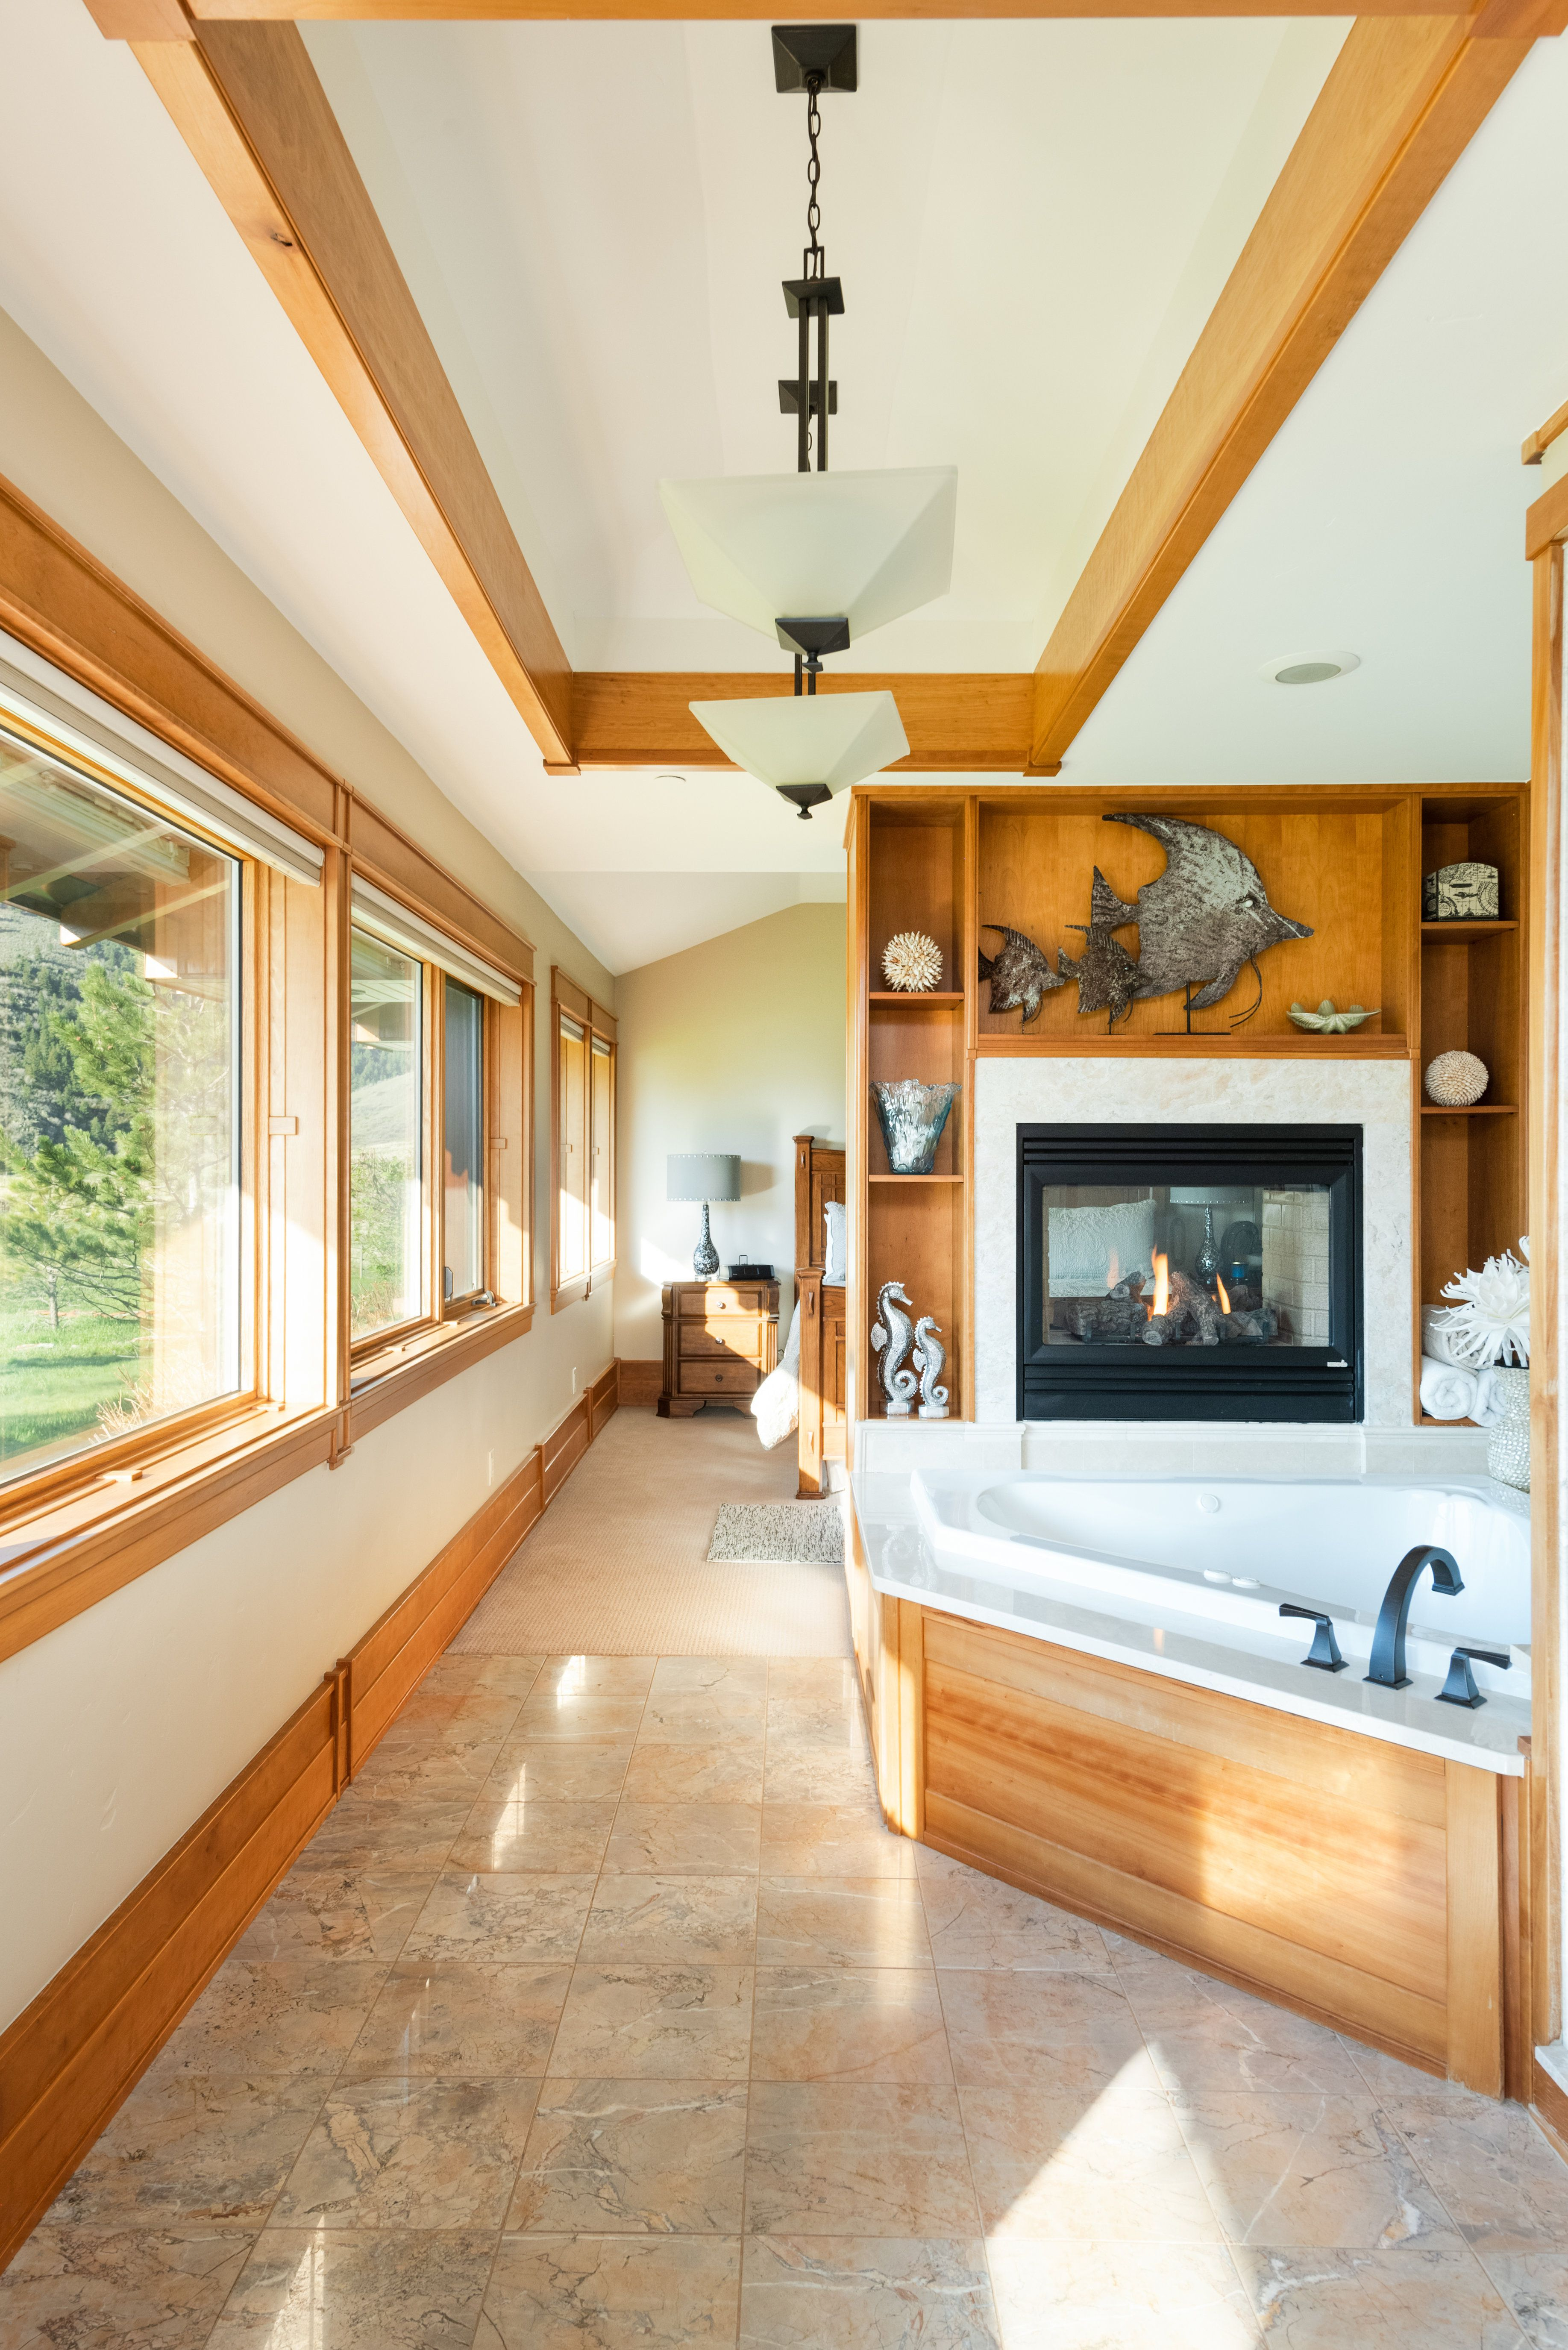 Colorado Mountain house on 35 acres asks $7M bathroom